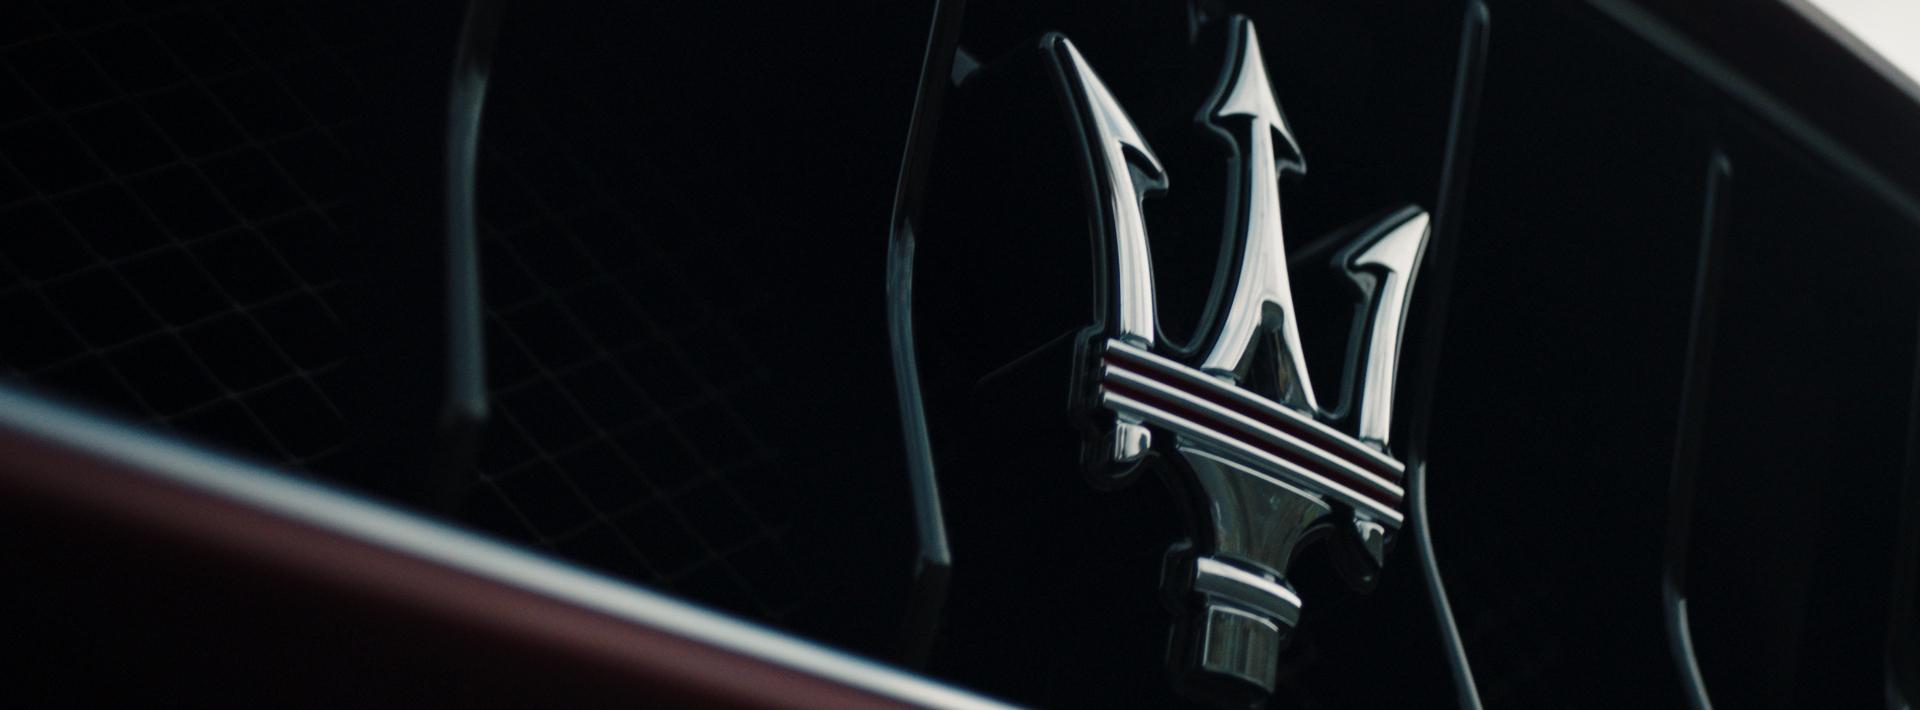 Maserati_1.94.1 copy.jpg